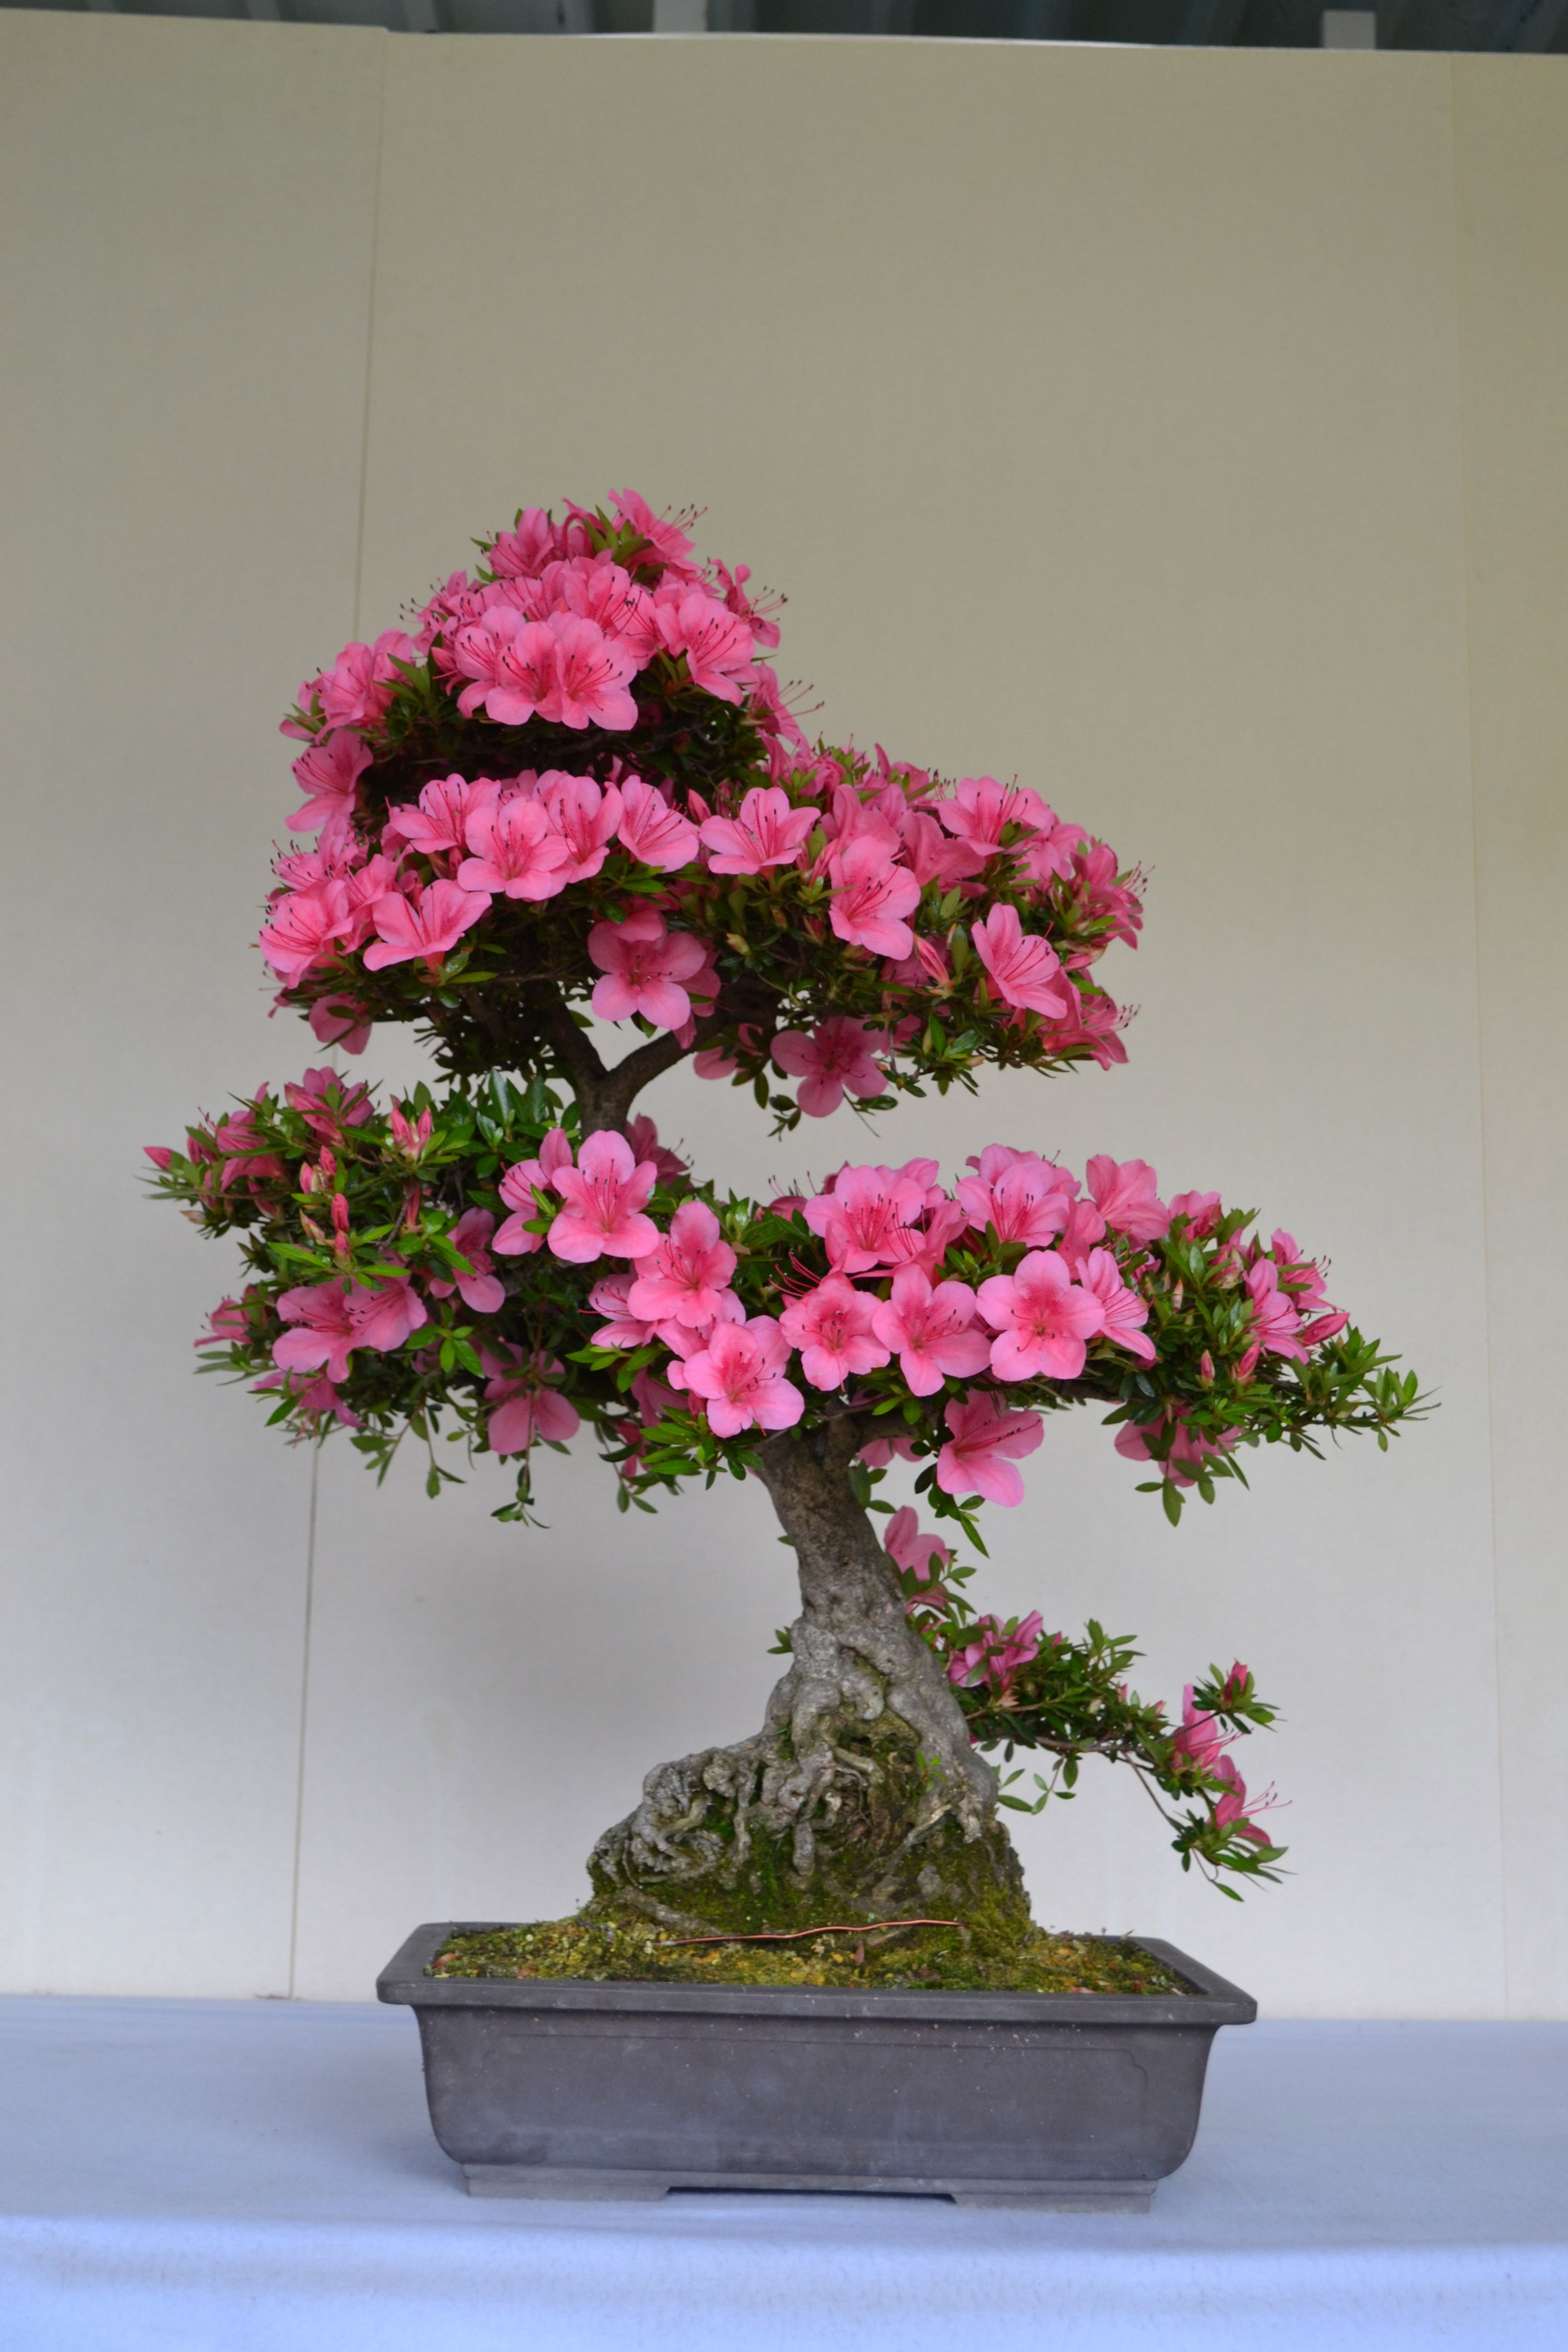 Satsuki Azaleas Bonsai azalea, Bonsai pruning, Bonsai tree